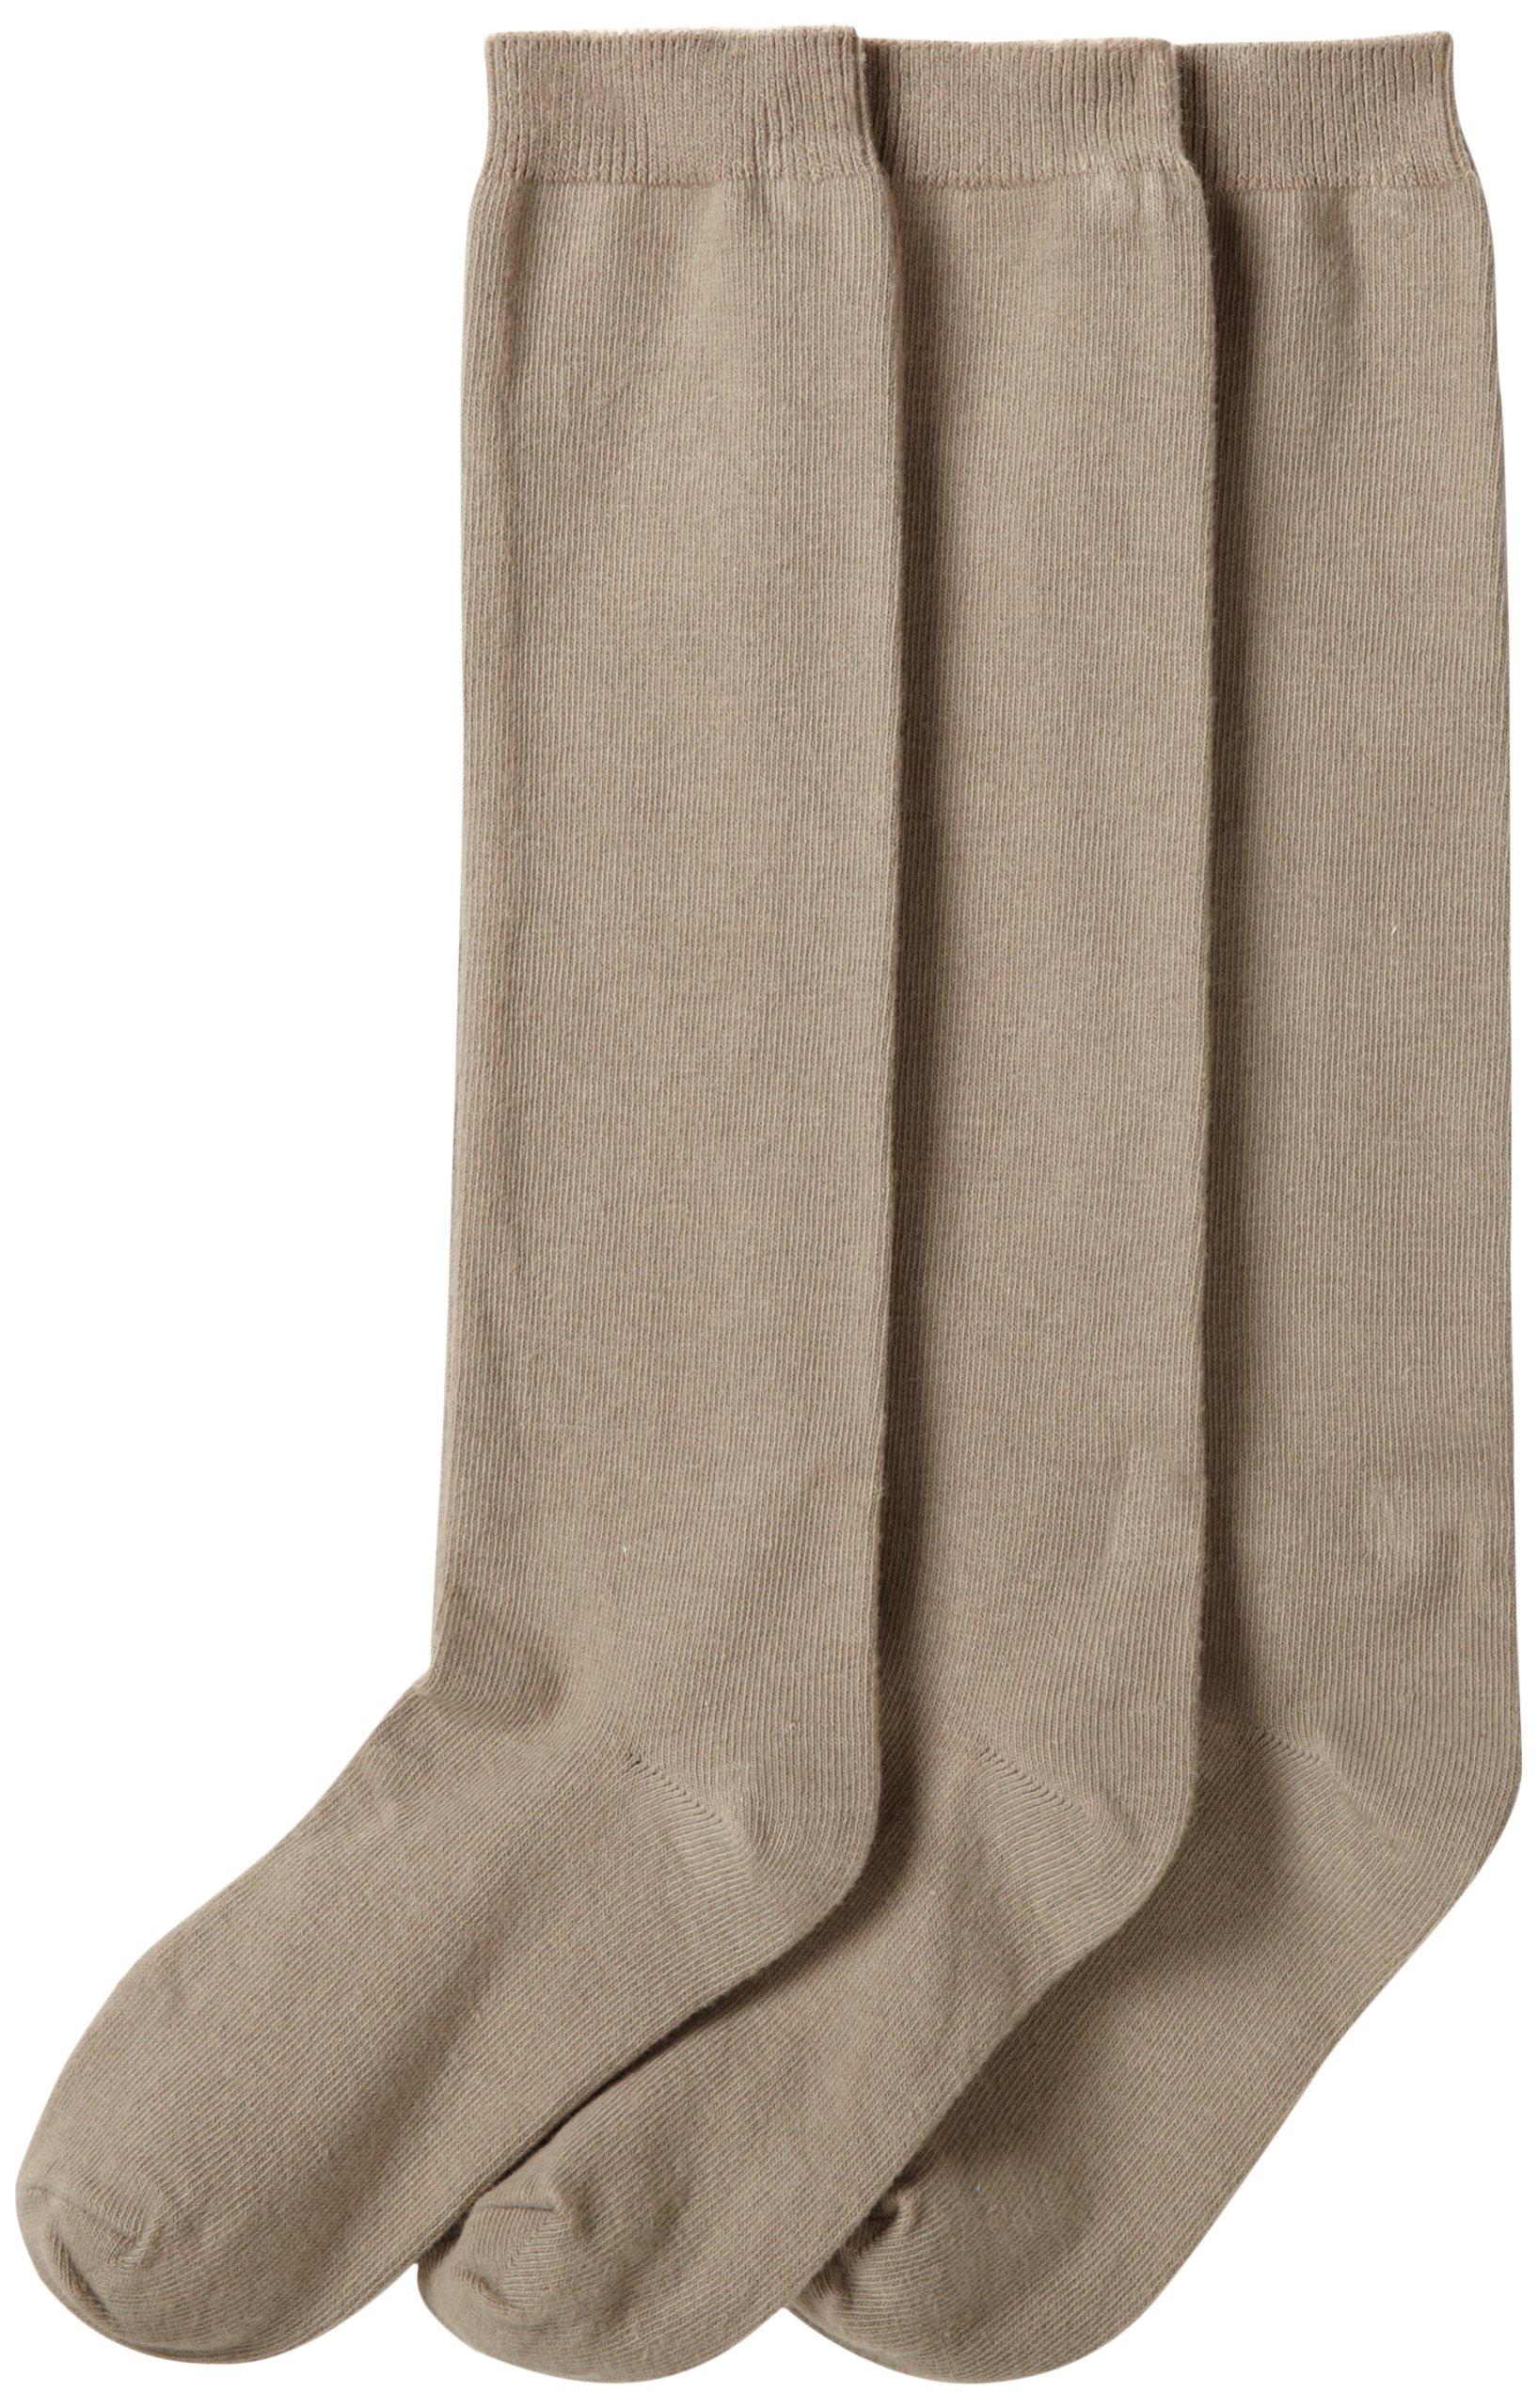 f7f7e79232a Get Quotations · Jefferies Socks Girls  School Uniform Knee-High Sock